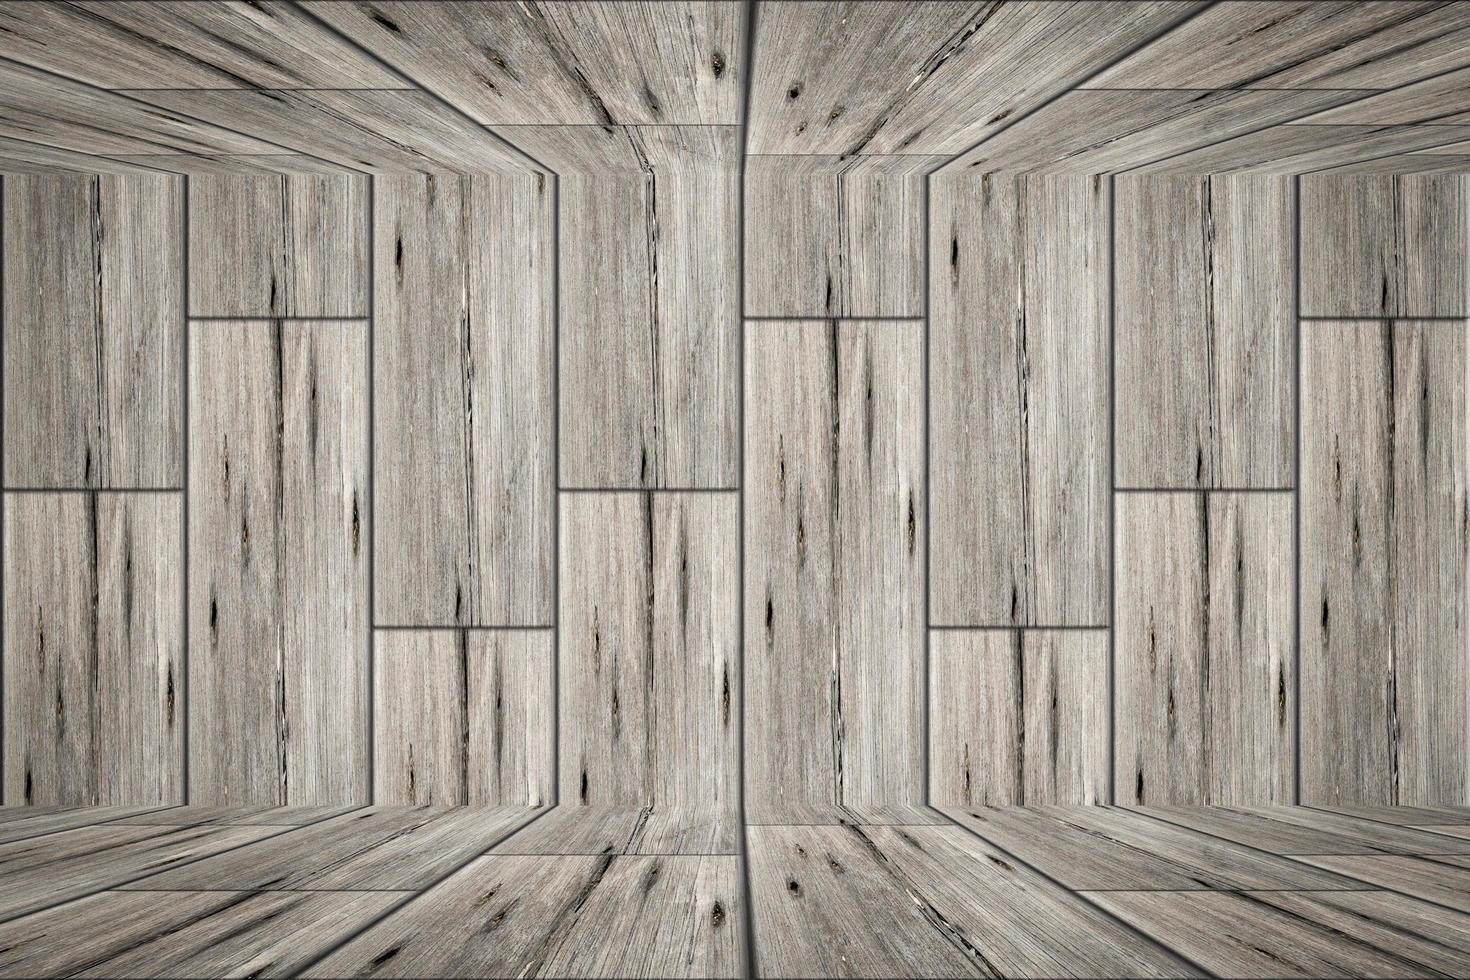 Wooden floor plates photo